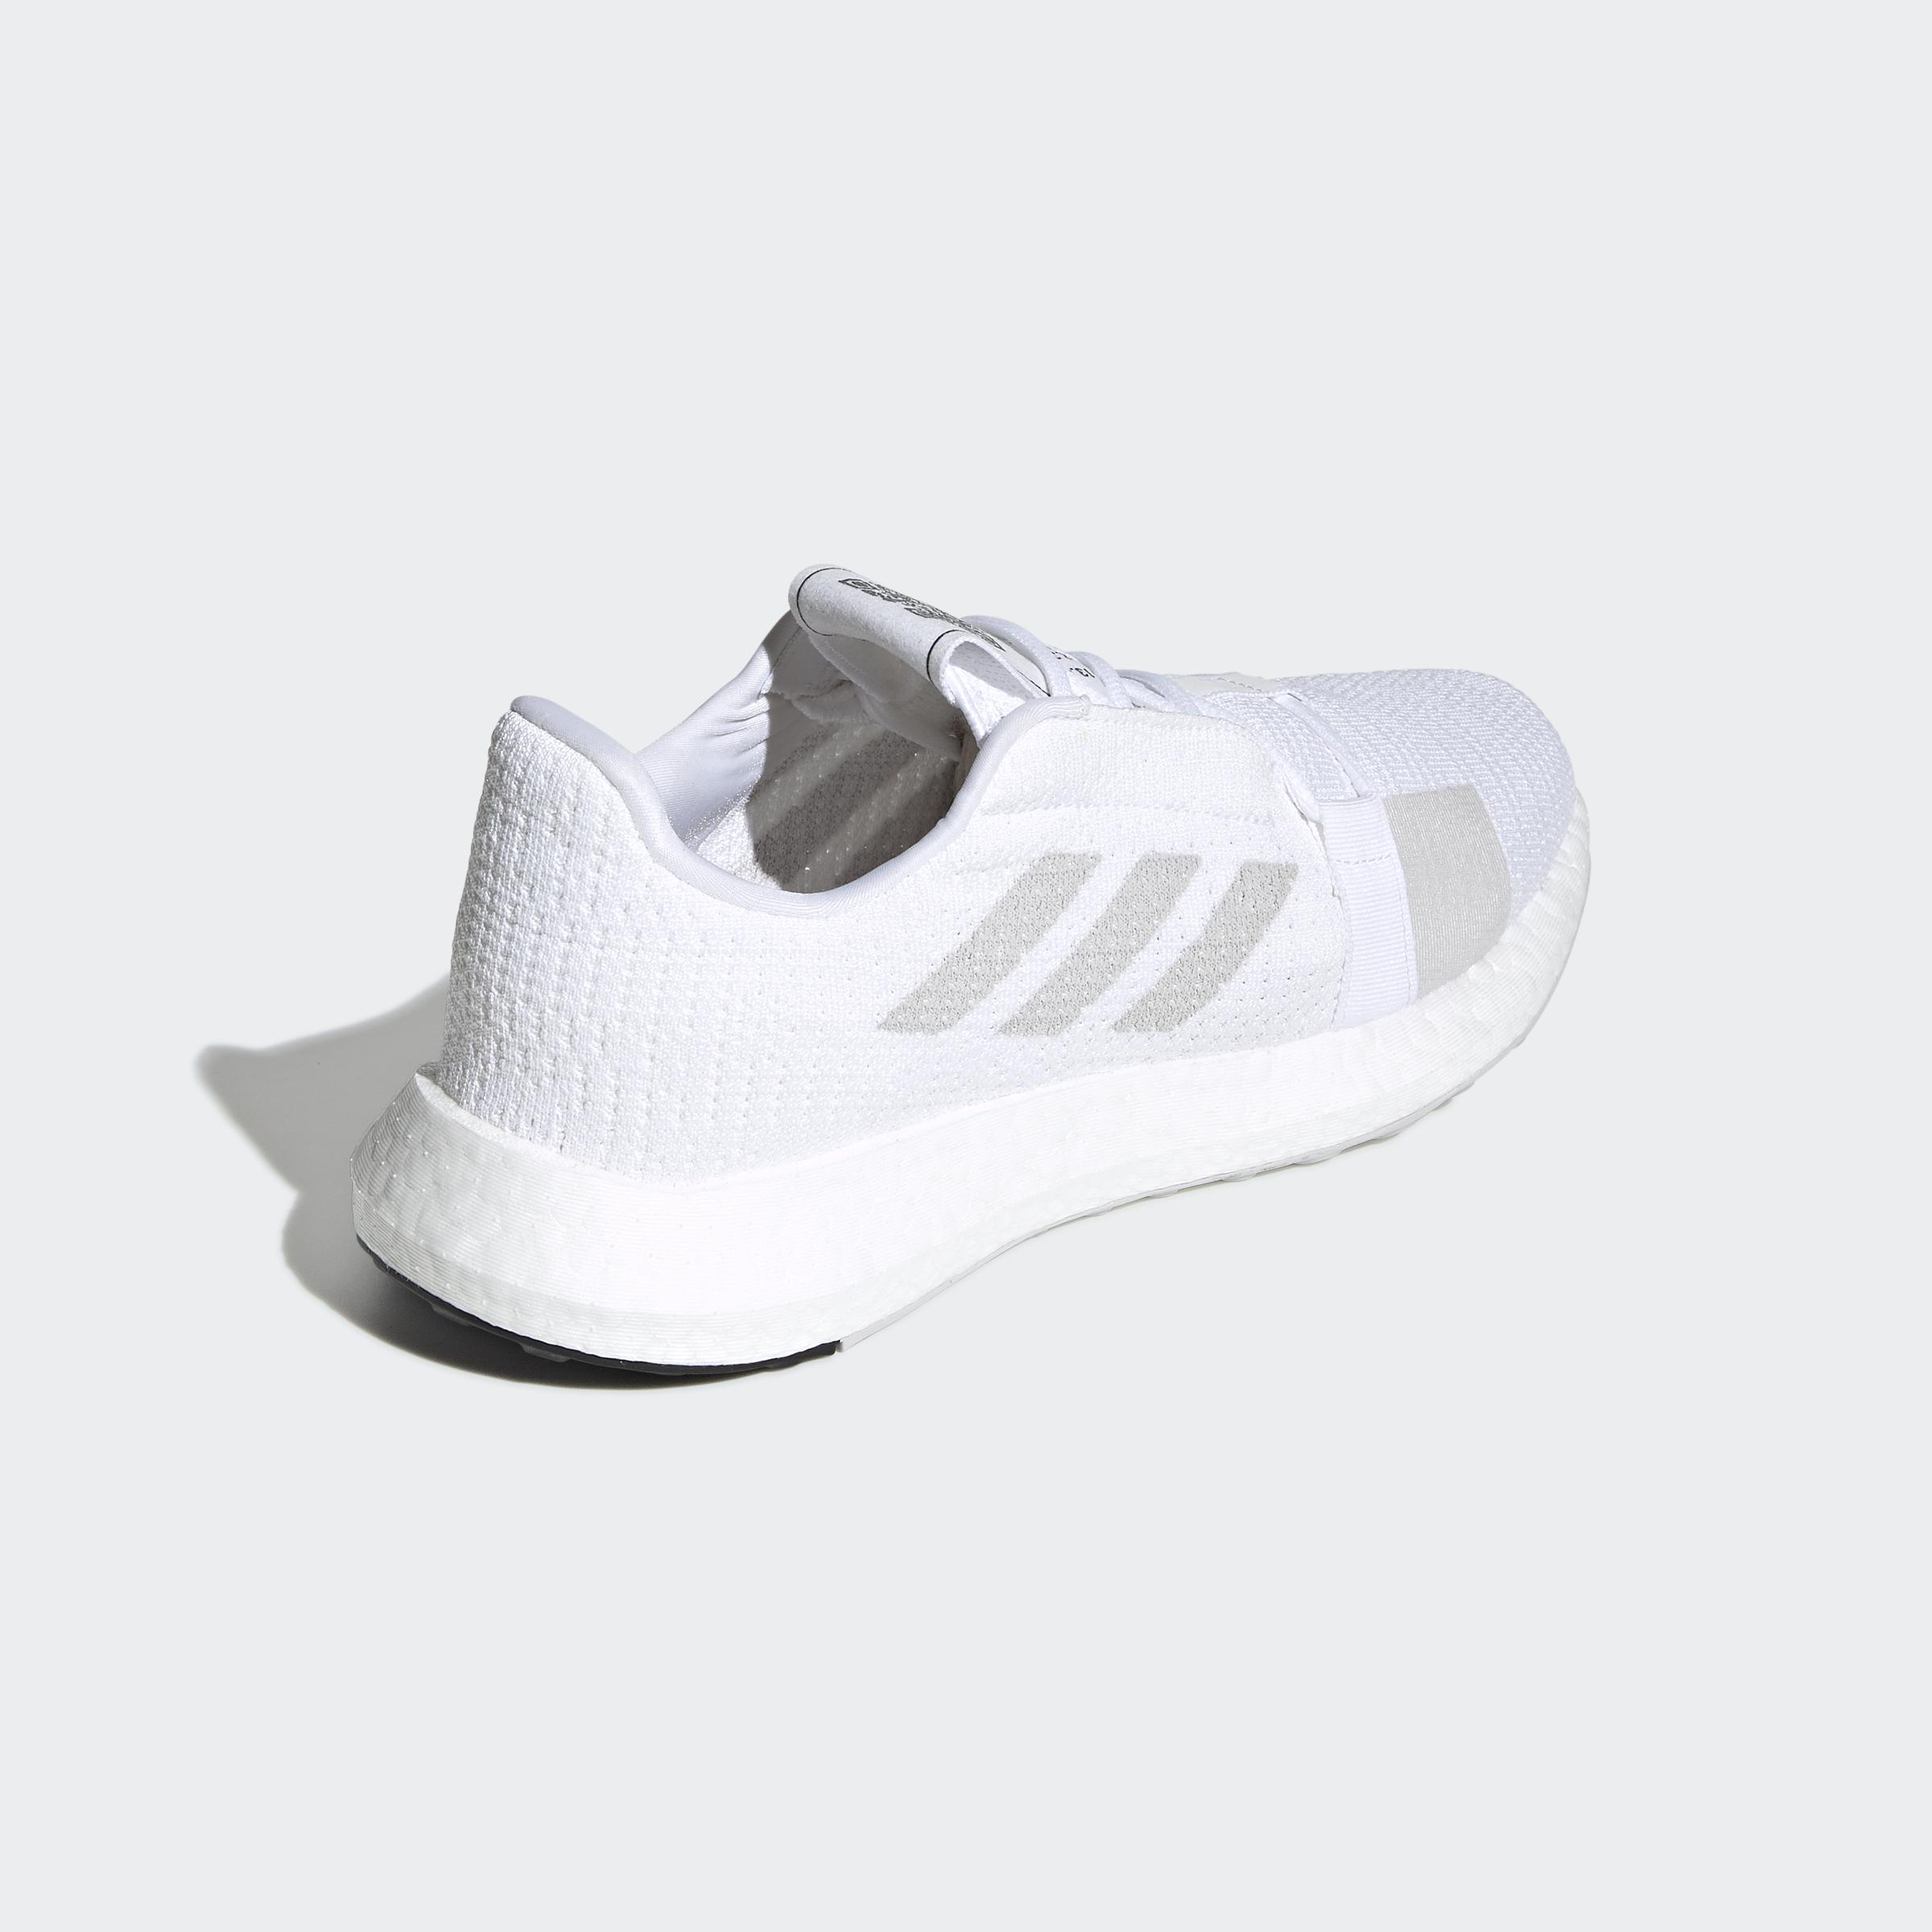 miniature 34 - adidas Senseboost Go Shoes Men's Athletic & Sneakers